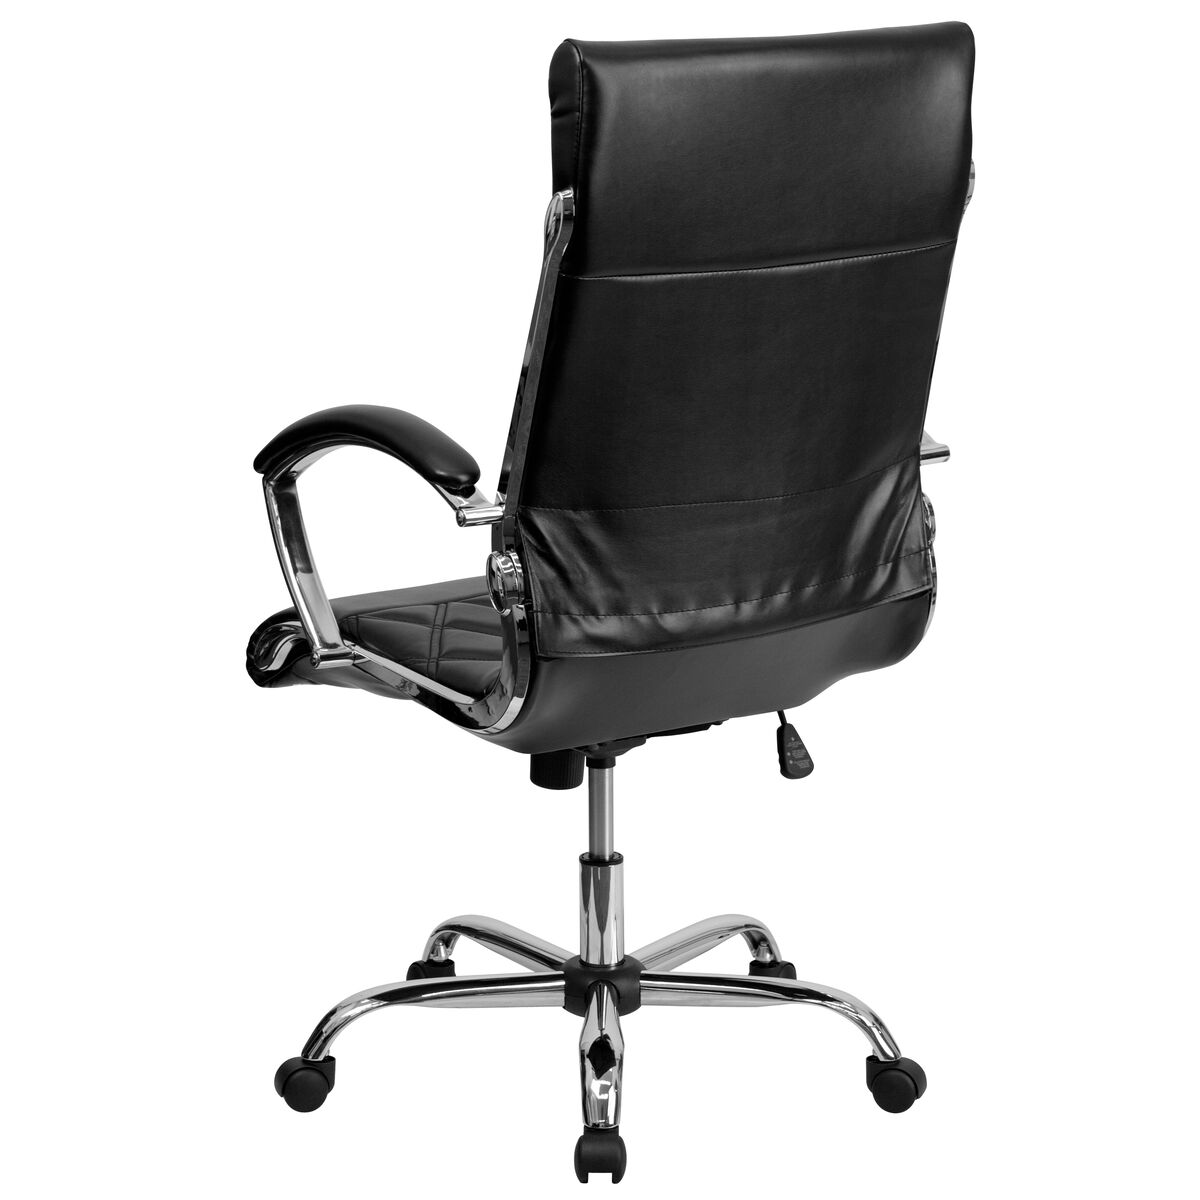 black high back leather chair go 1297h high bk gg